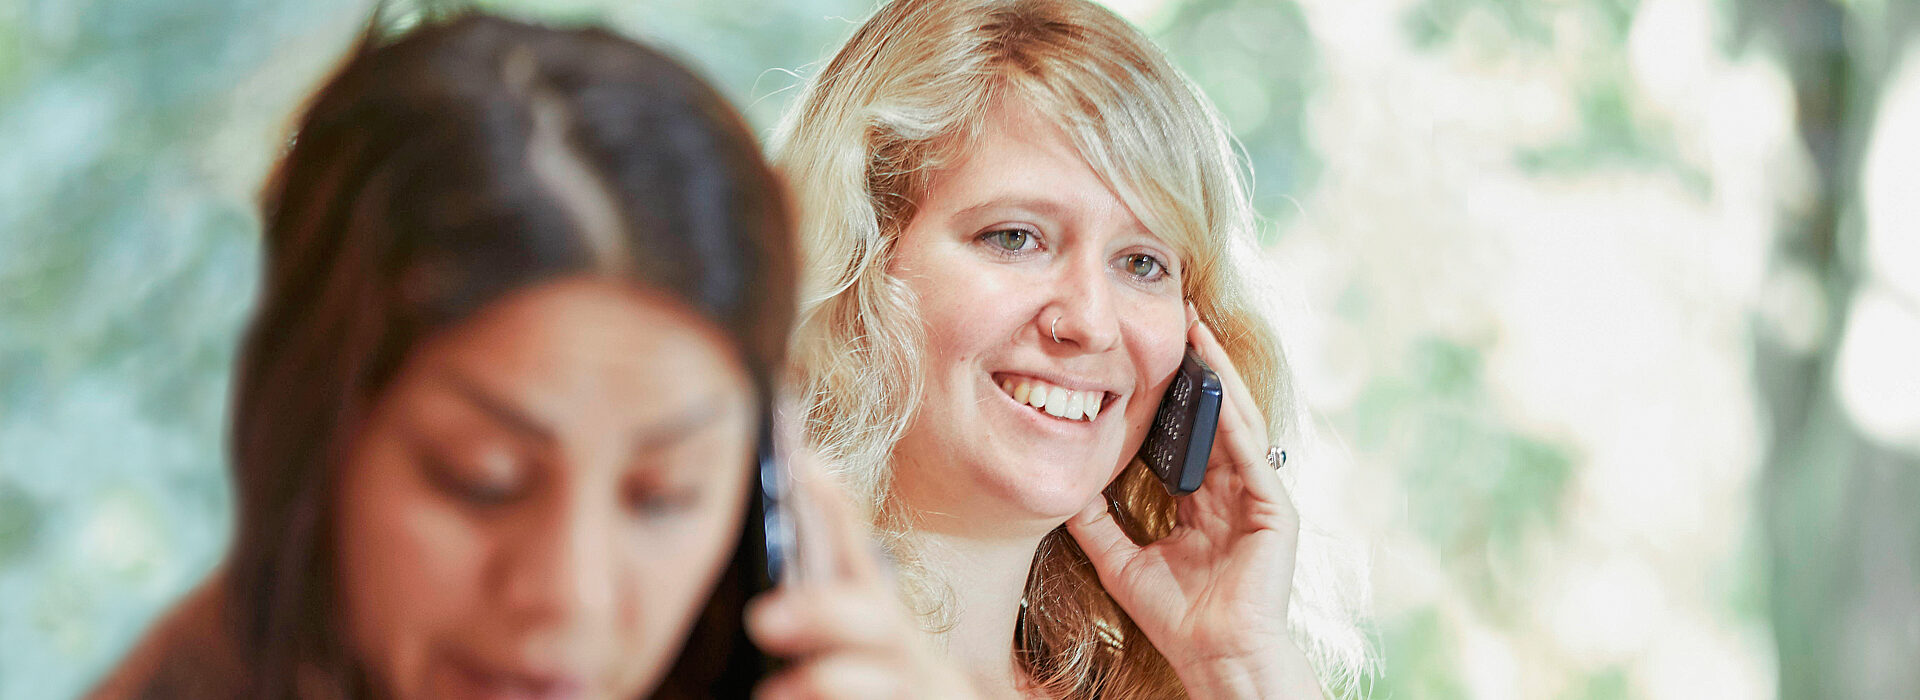 Foto: Telefonische Beratung - direkt verbunden